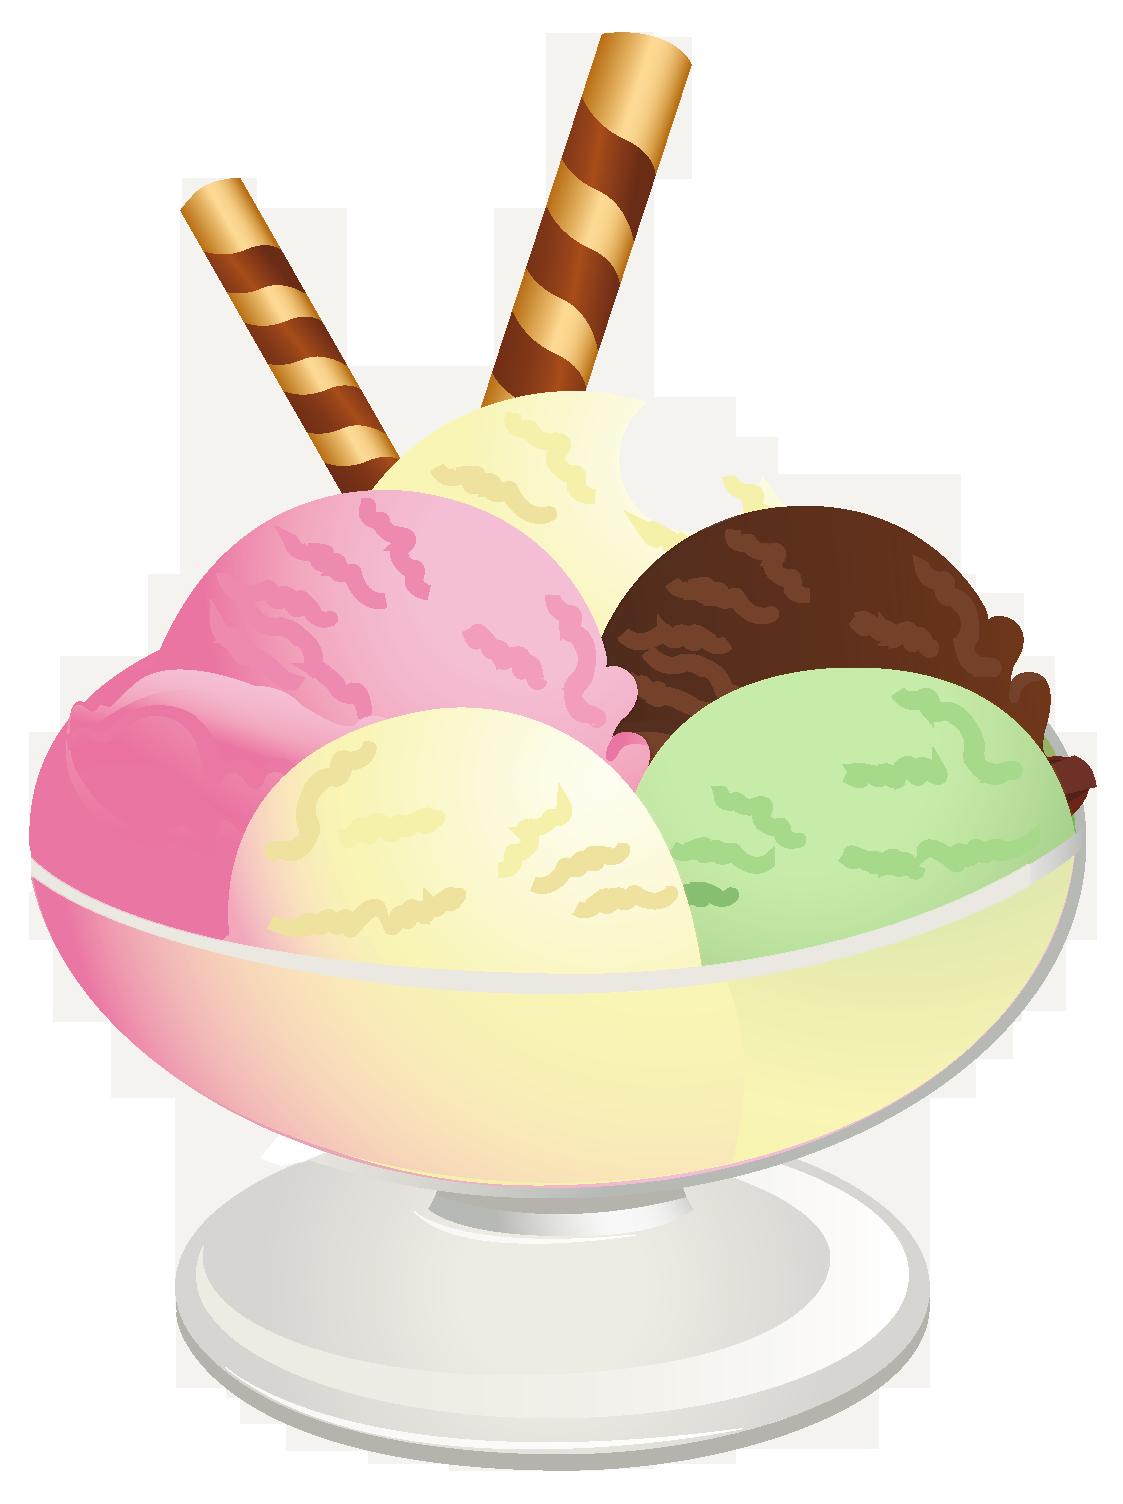 Clip Art Ice Cream Sundae Clip Art free clip art ice cream sundae clipart best tumundografico